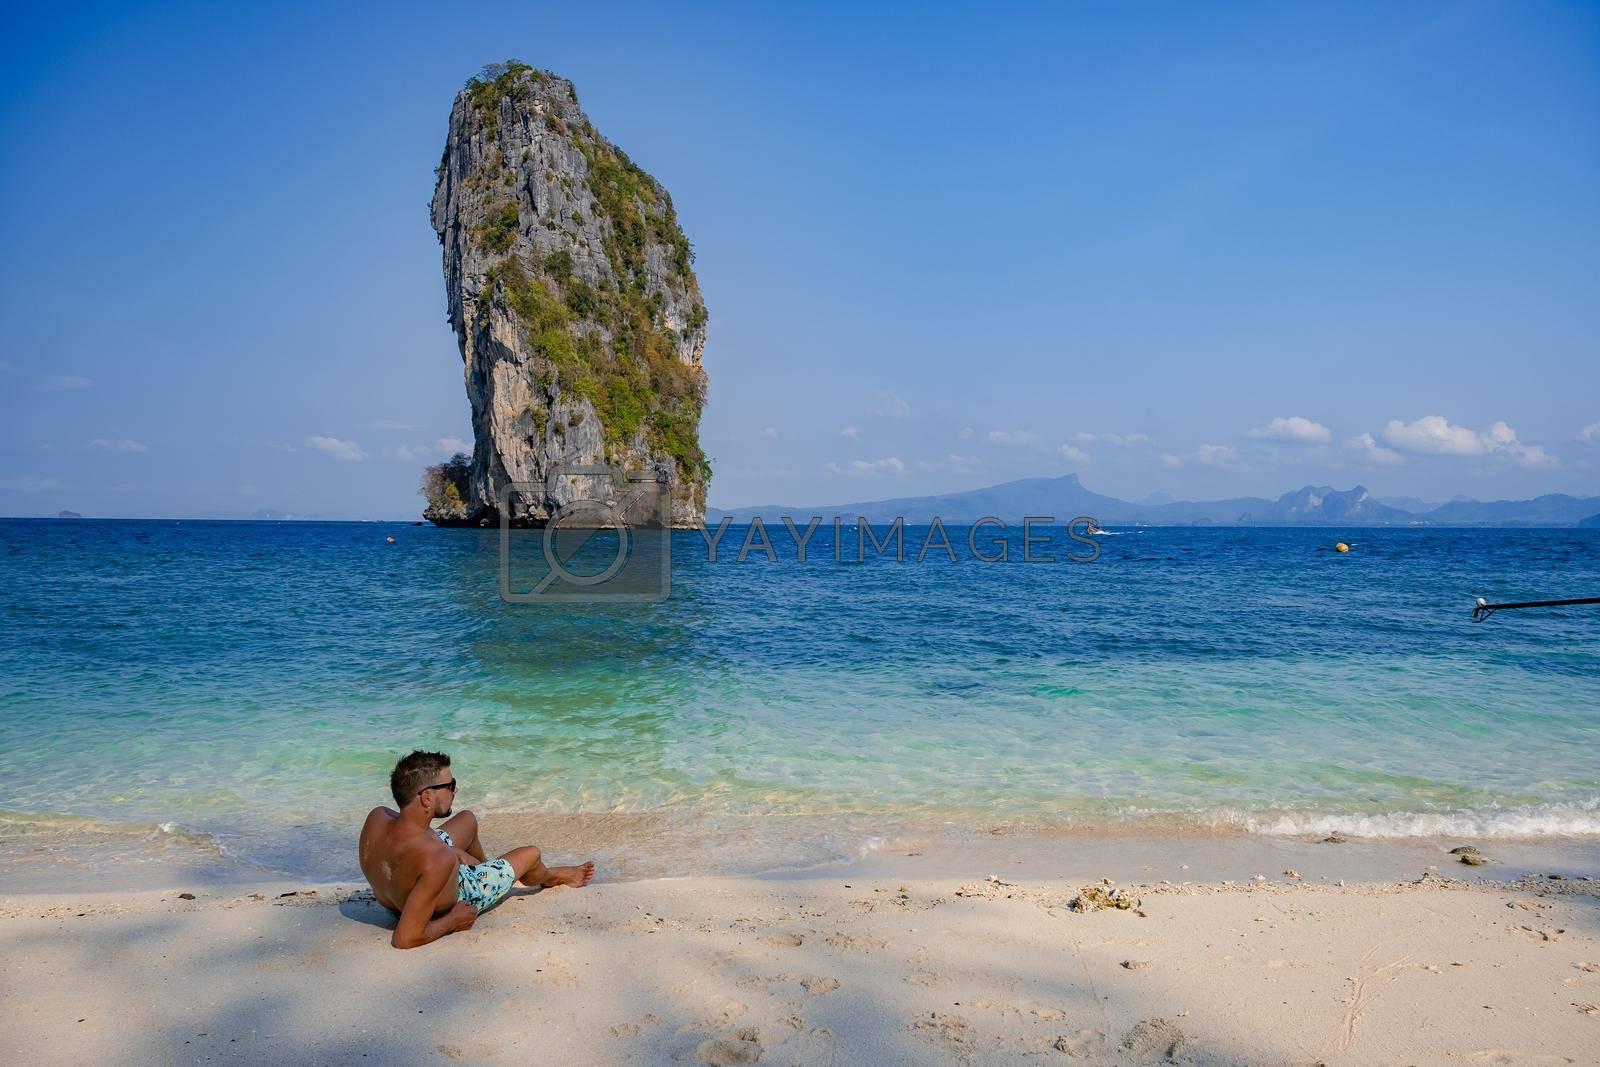 Koh Poda Island Thailand, couple mid age Asian woman and European man on the beach, Koh Poda Thailand, beautiful tropical beach of Koh Poda, Poda Island in Krabi province of Thailand South East Asian